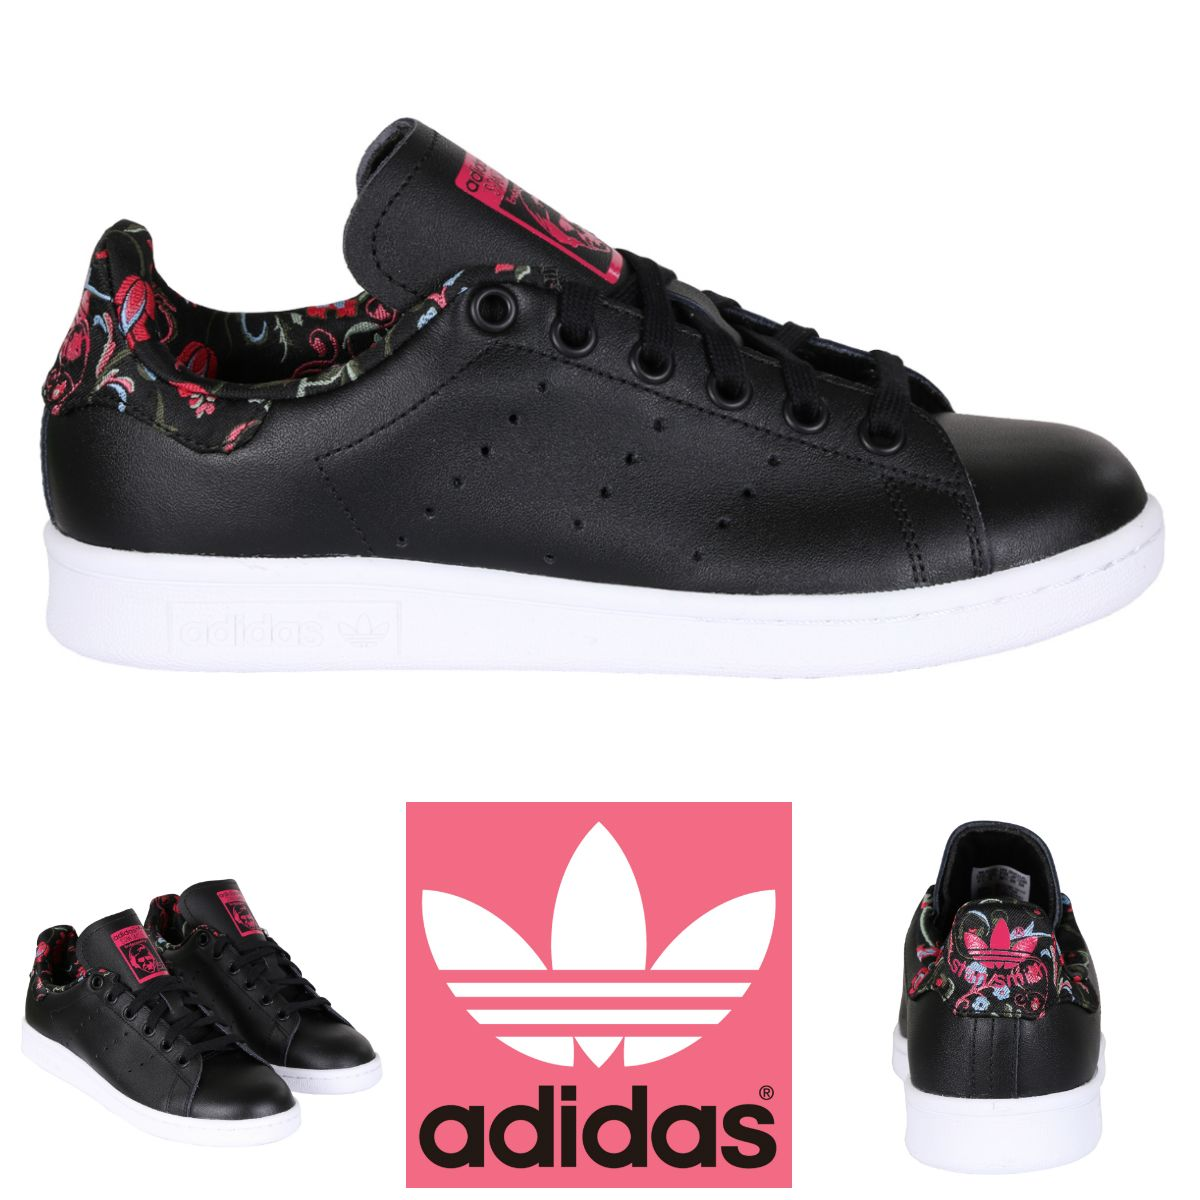 adidas Originals Stan Smith 'Moscow Rose' ➡ http://www.hoodboyz